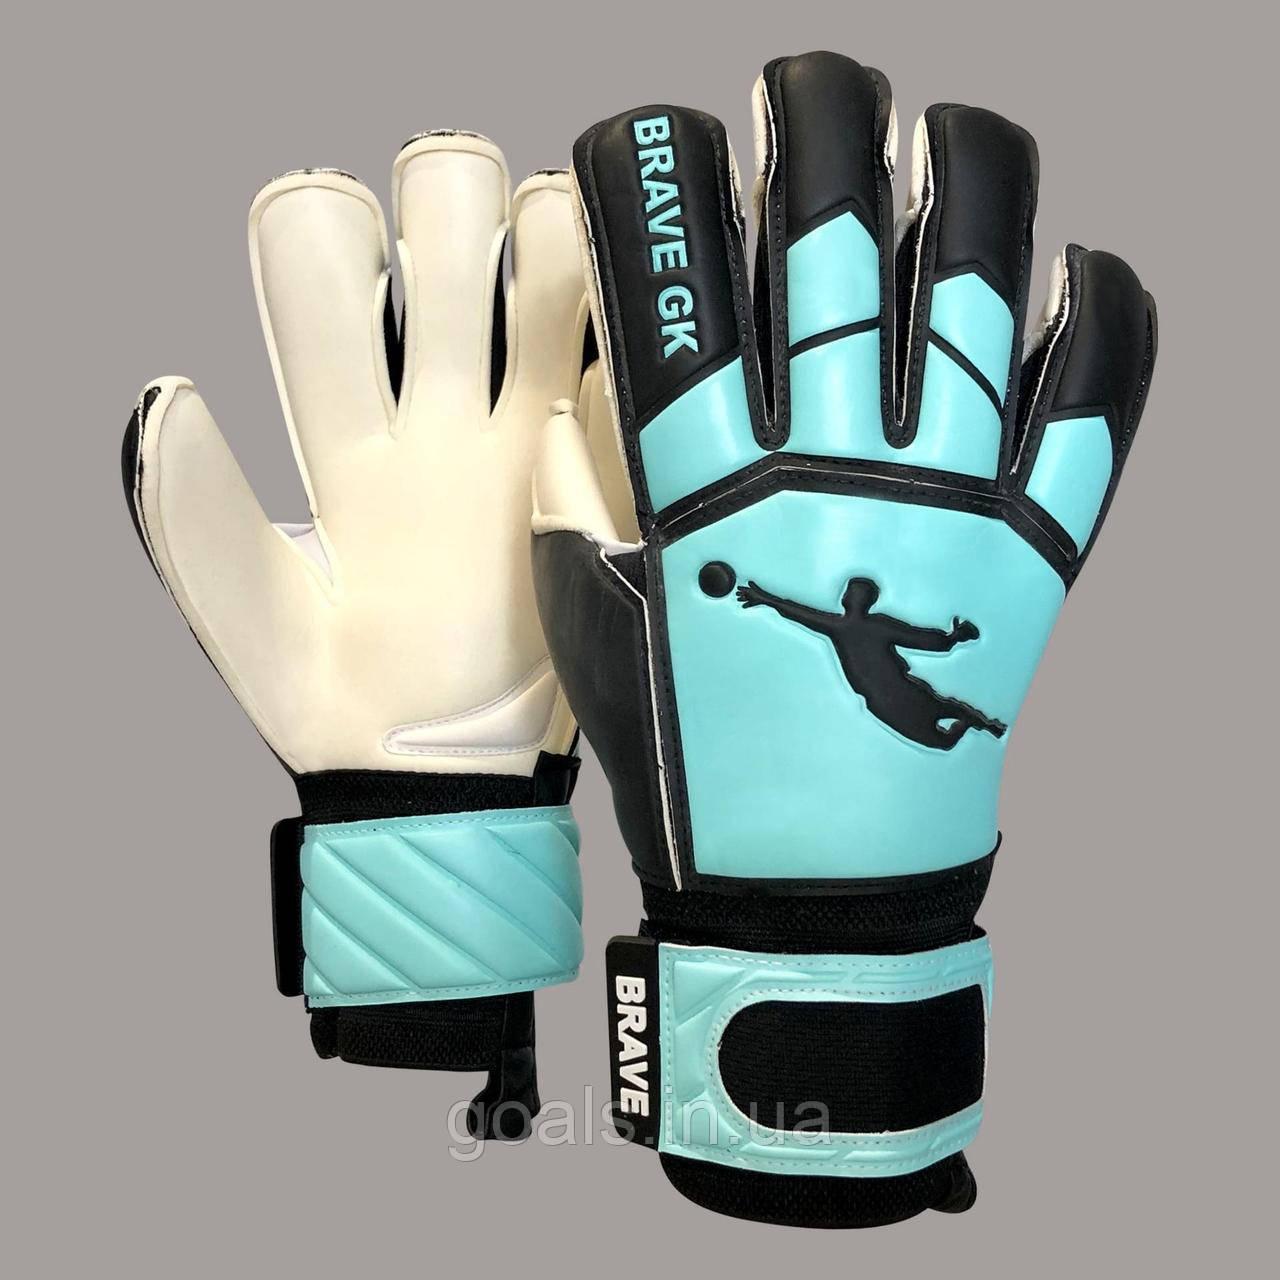 Перчатки вратарские BRAVE GK WINNER BLACK/TURQ Р.4